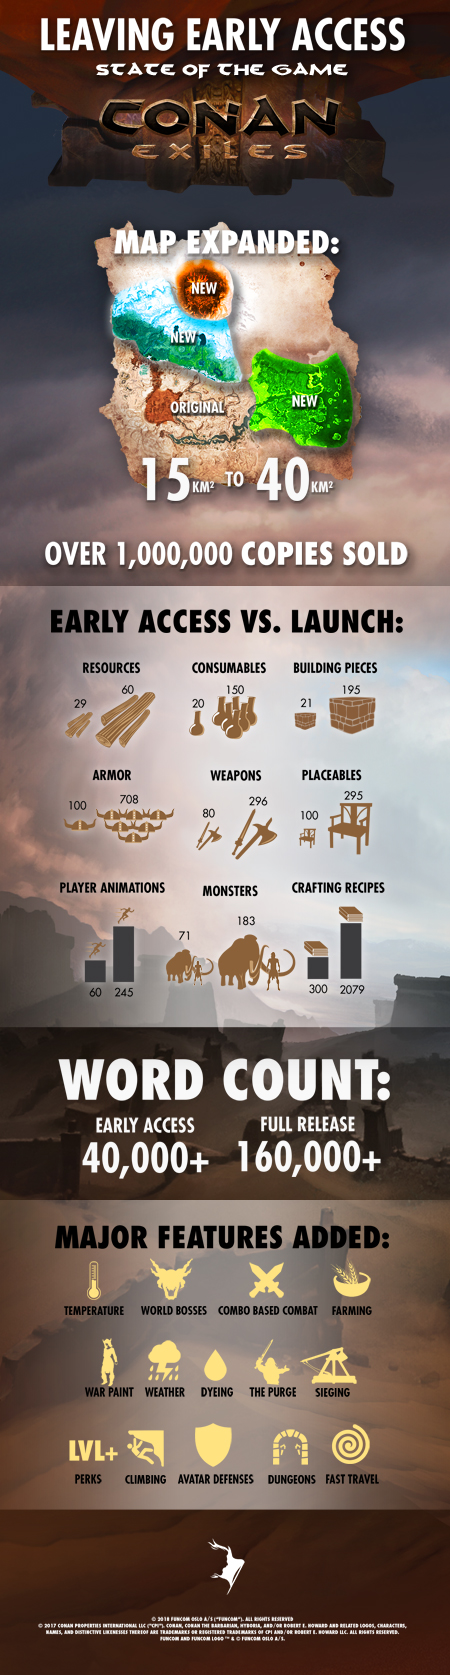 infographic_launch4-smaller.jpg